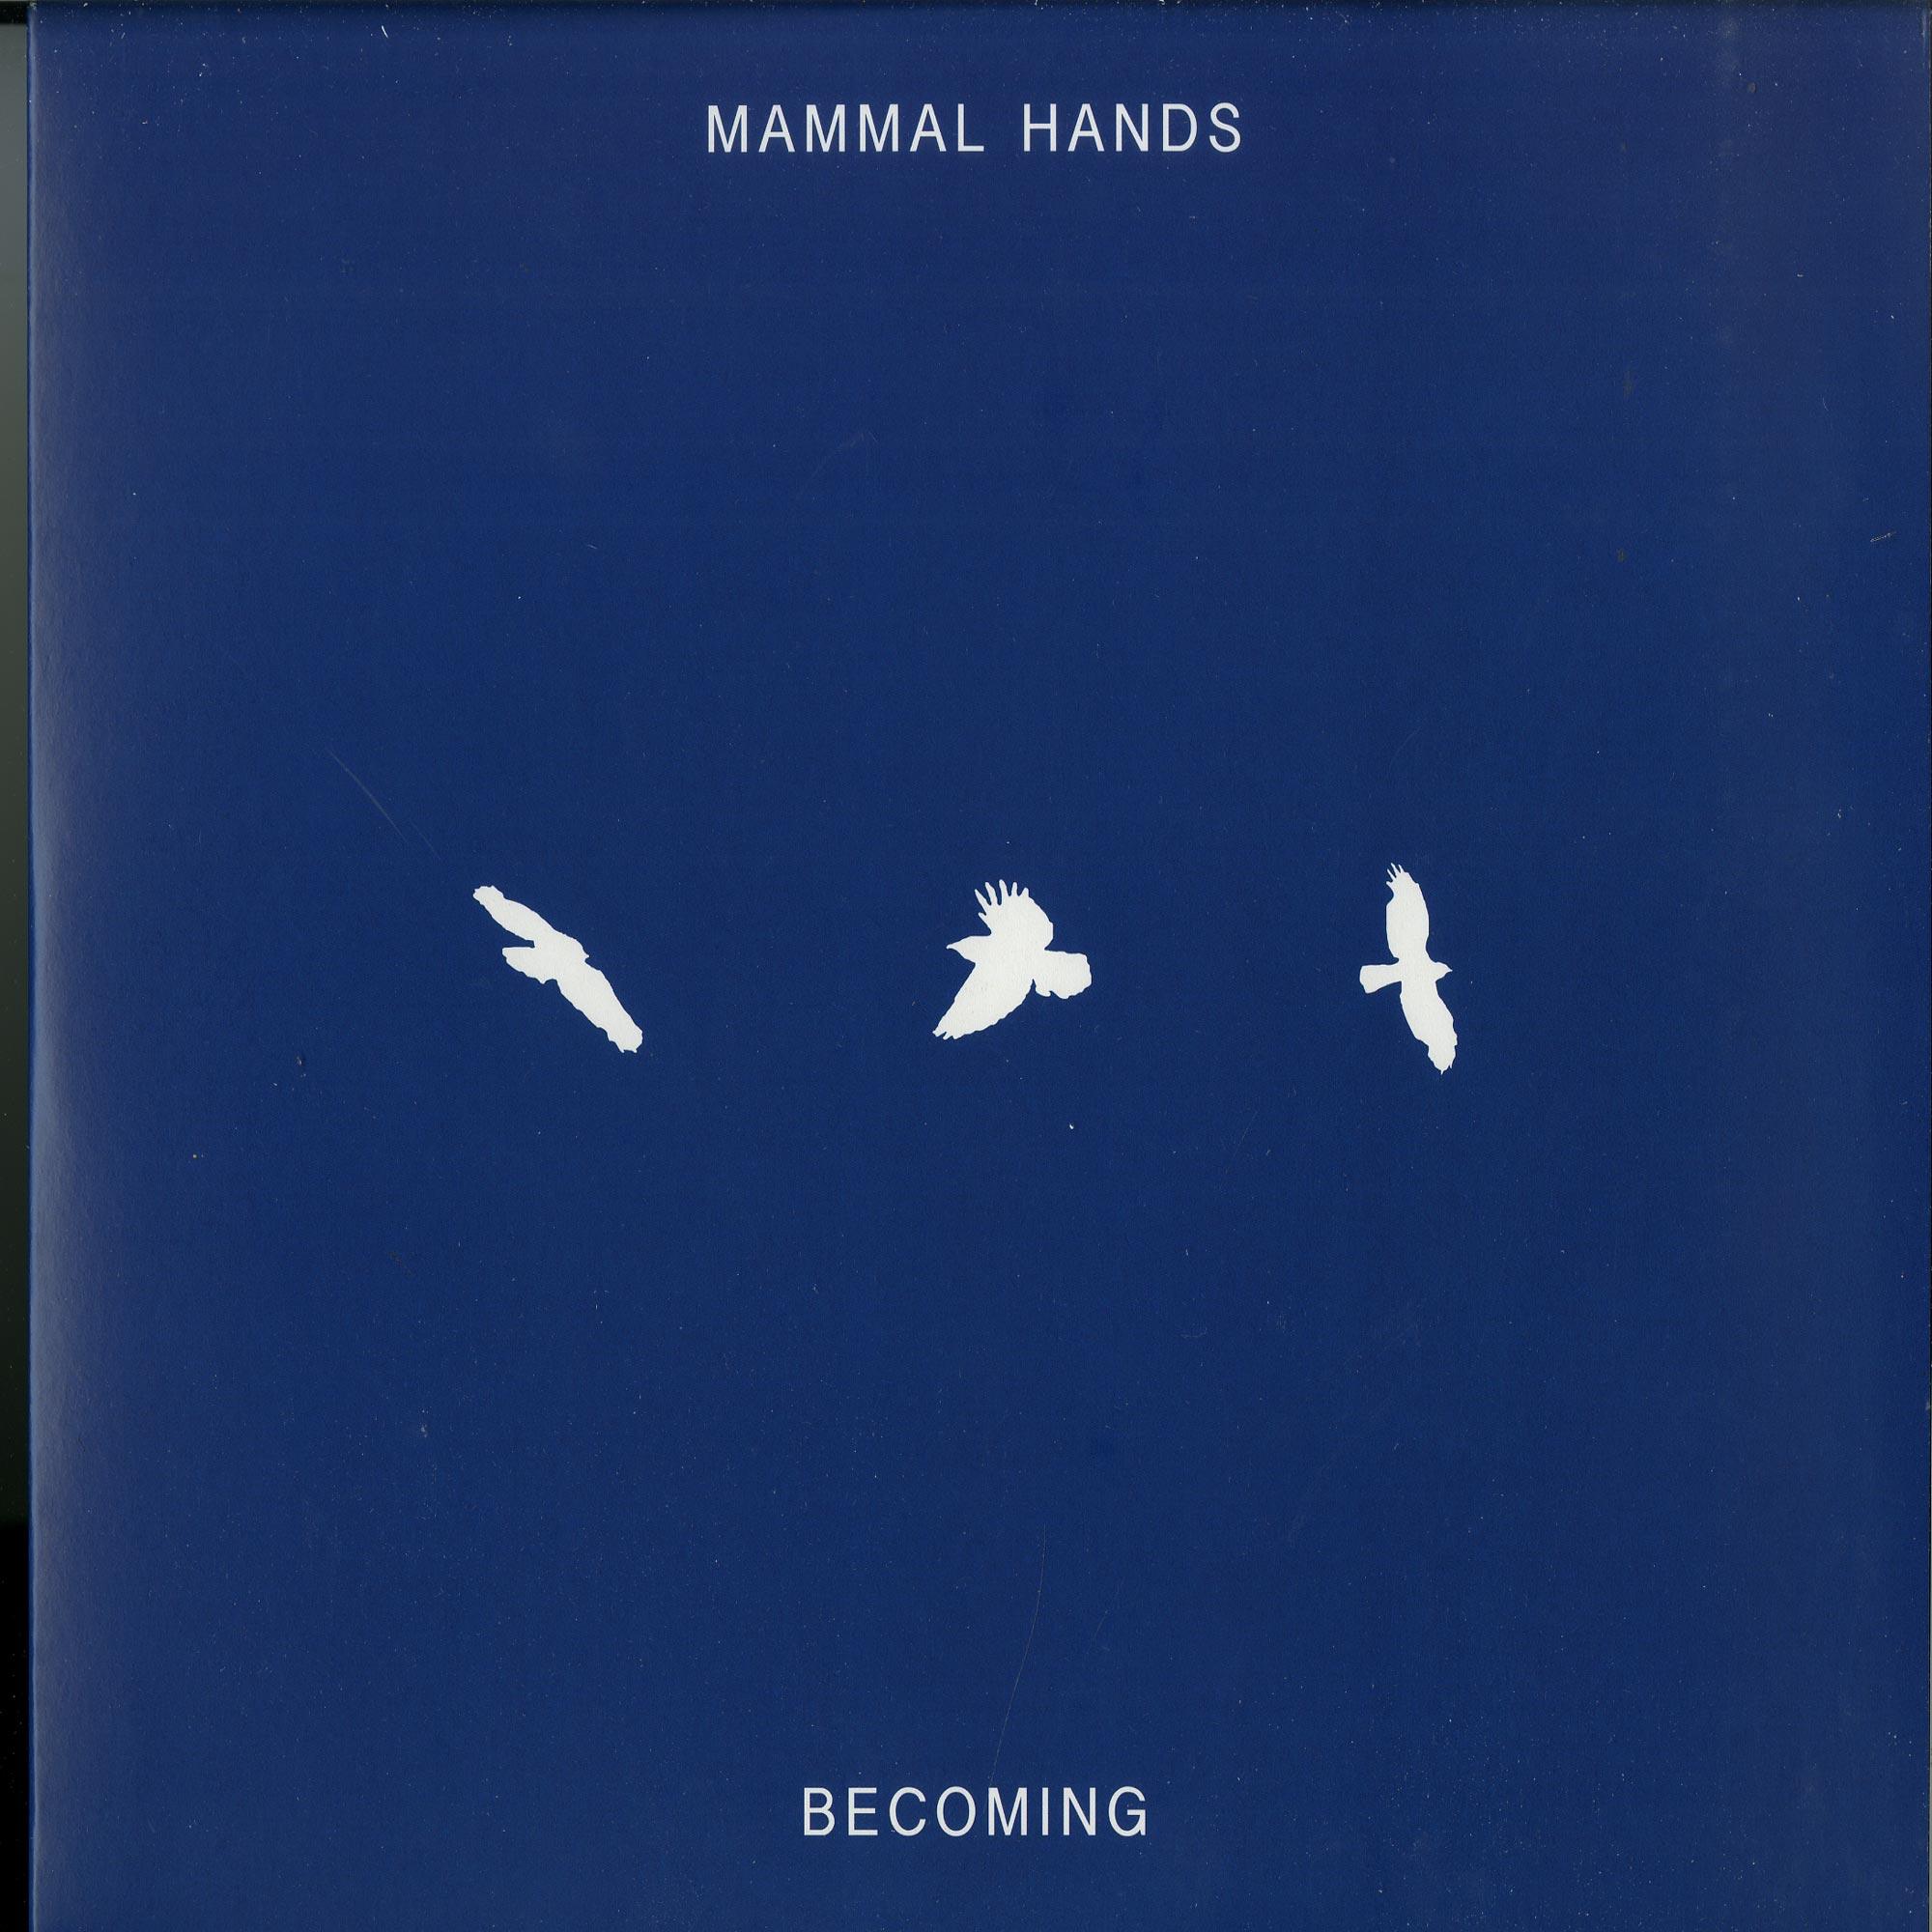 Mammal Hands - BECOMING